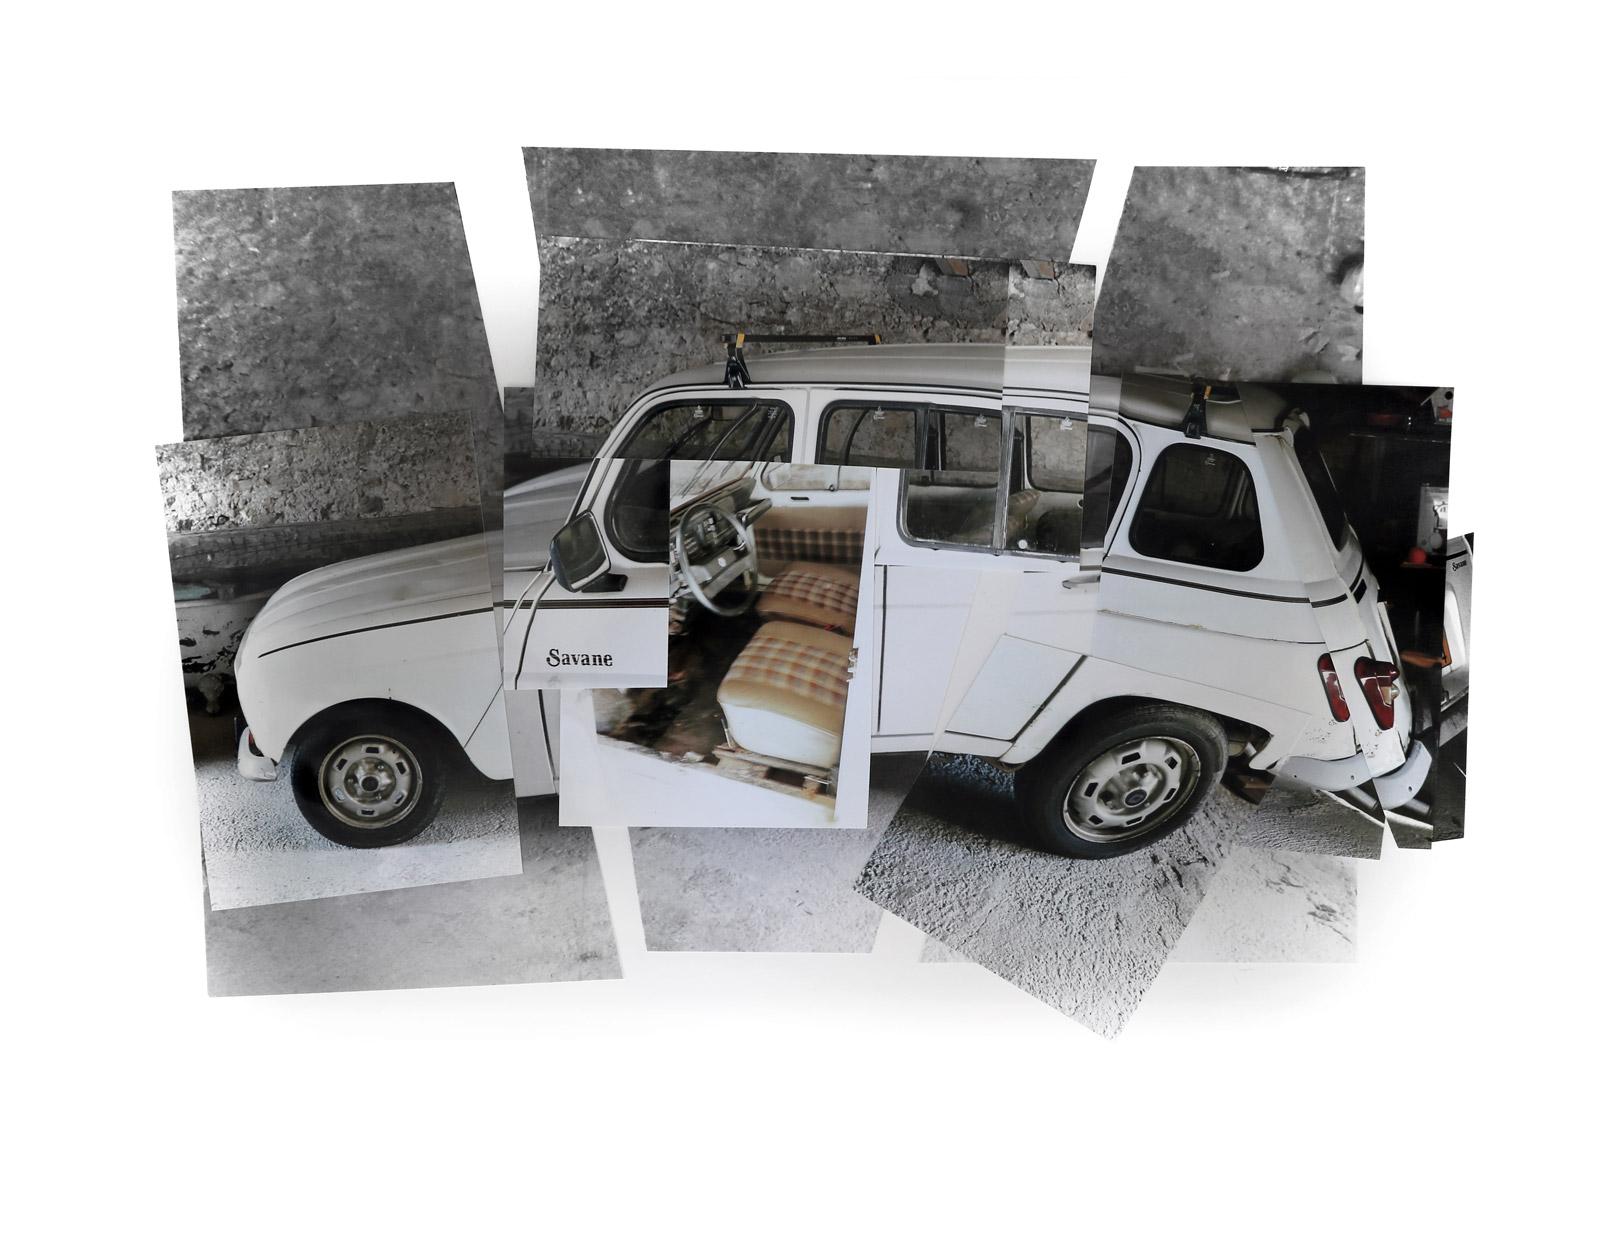 photomontage series, collage no. 4